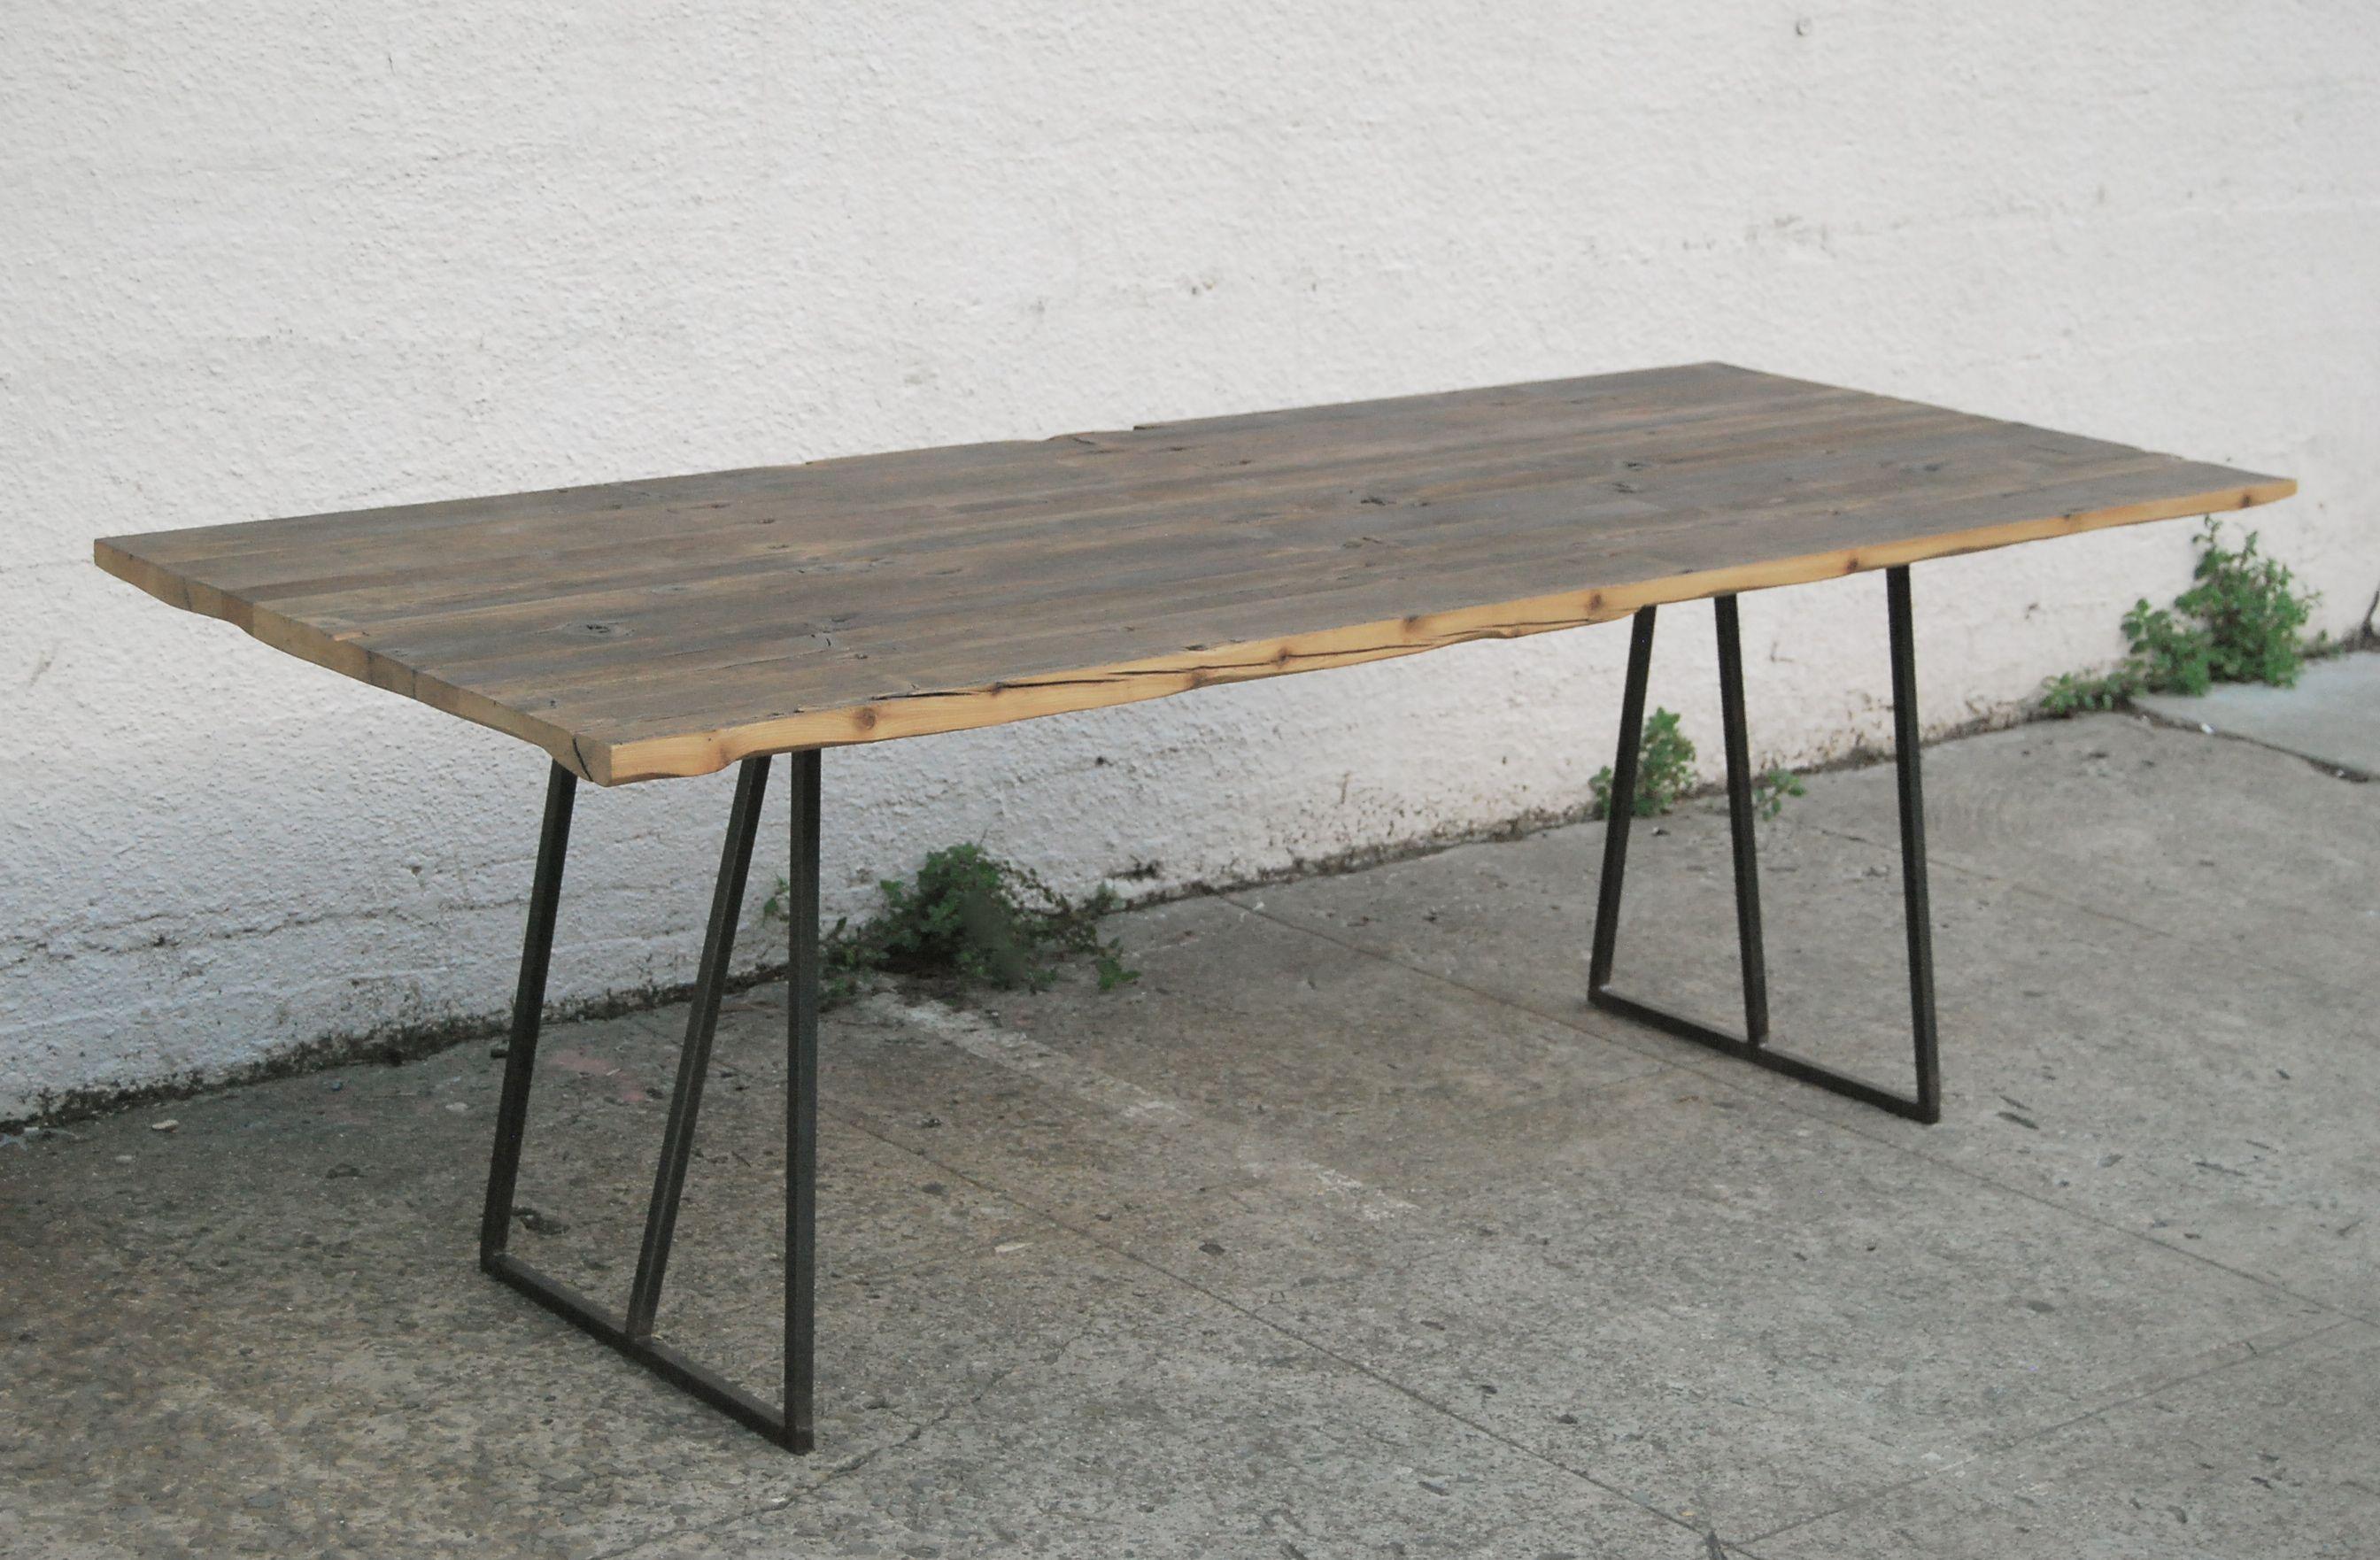 dining table with metal base Furniture Pinterest  : 91450ffebc55c3395e3cf2c1d6d4f998 from www.pinterest.com size 2688 x 1762 jpeg 1530kB